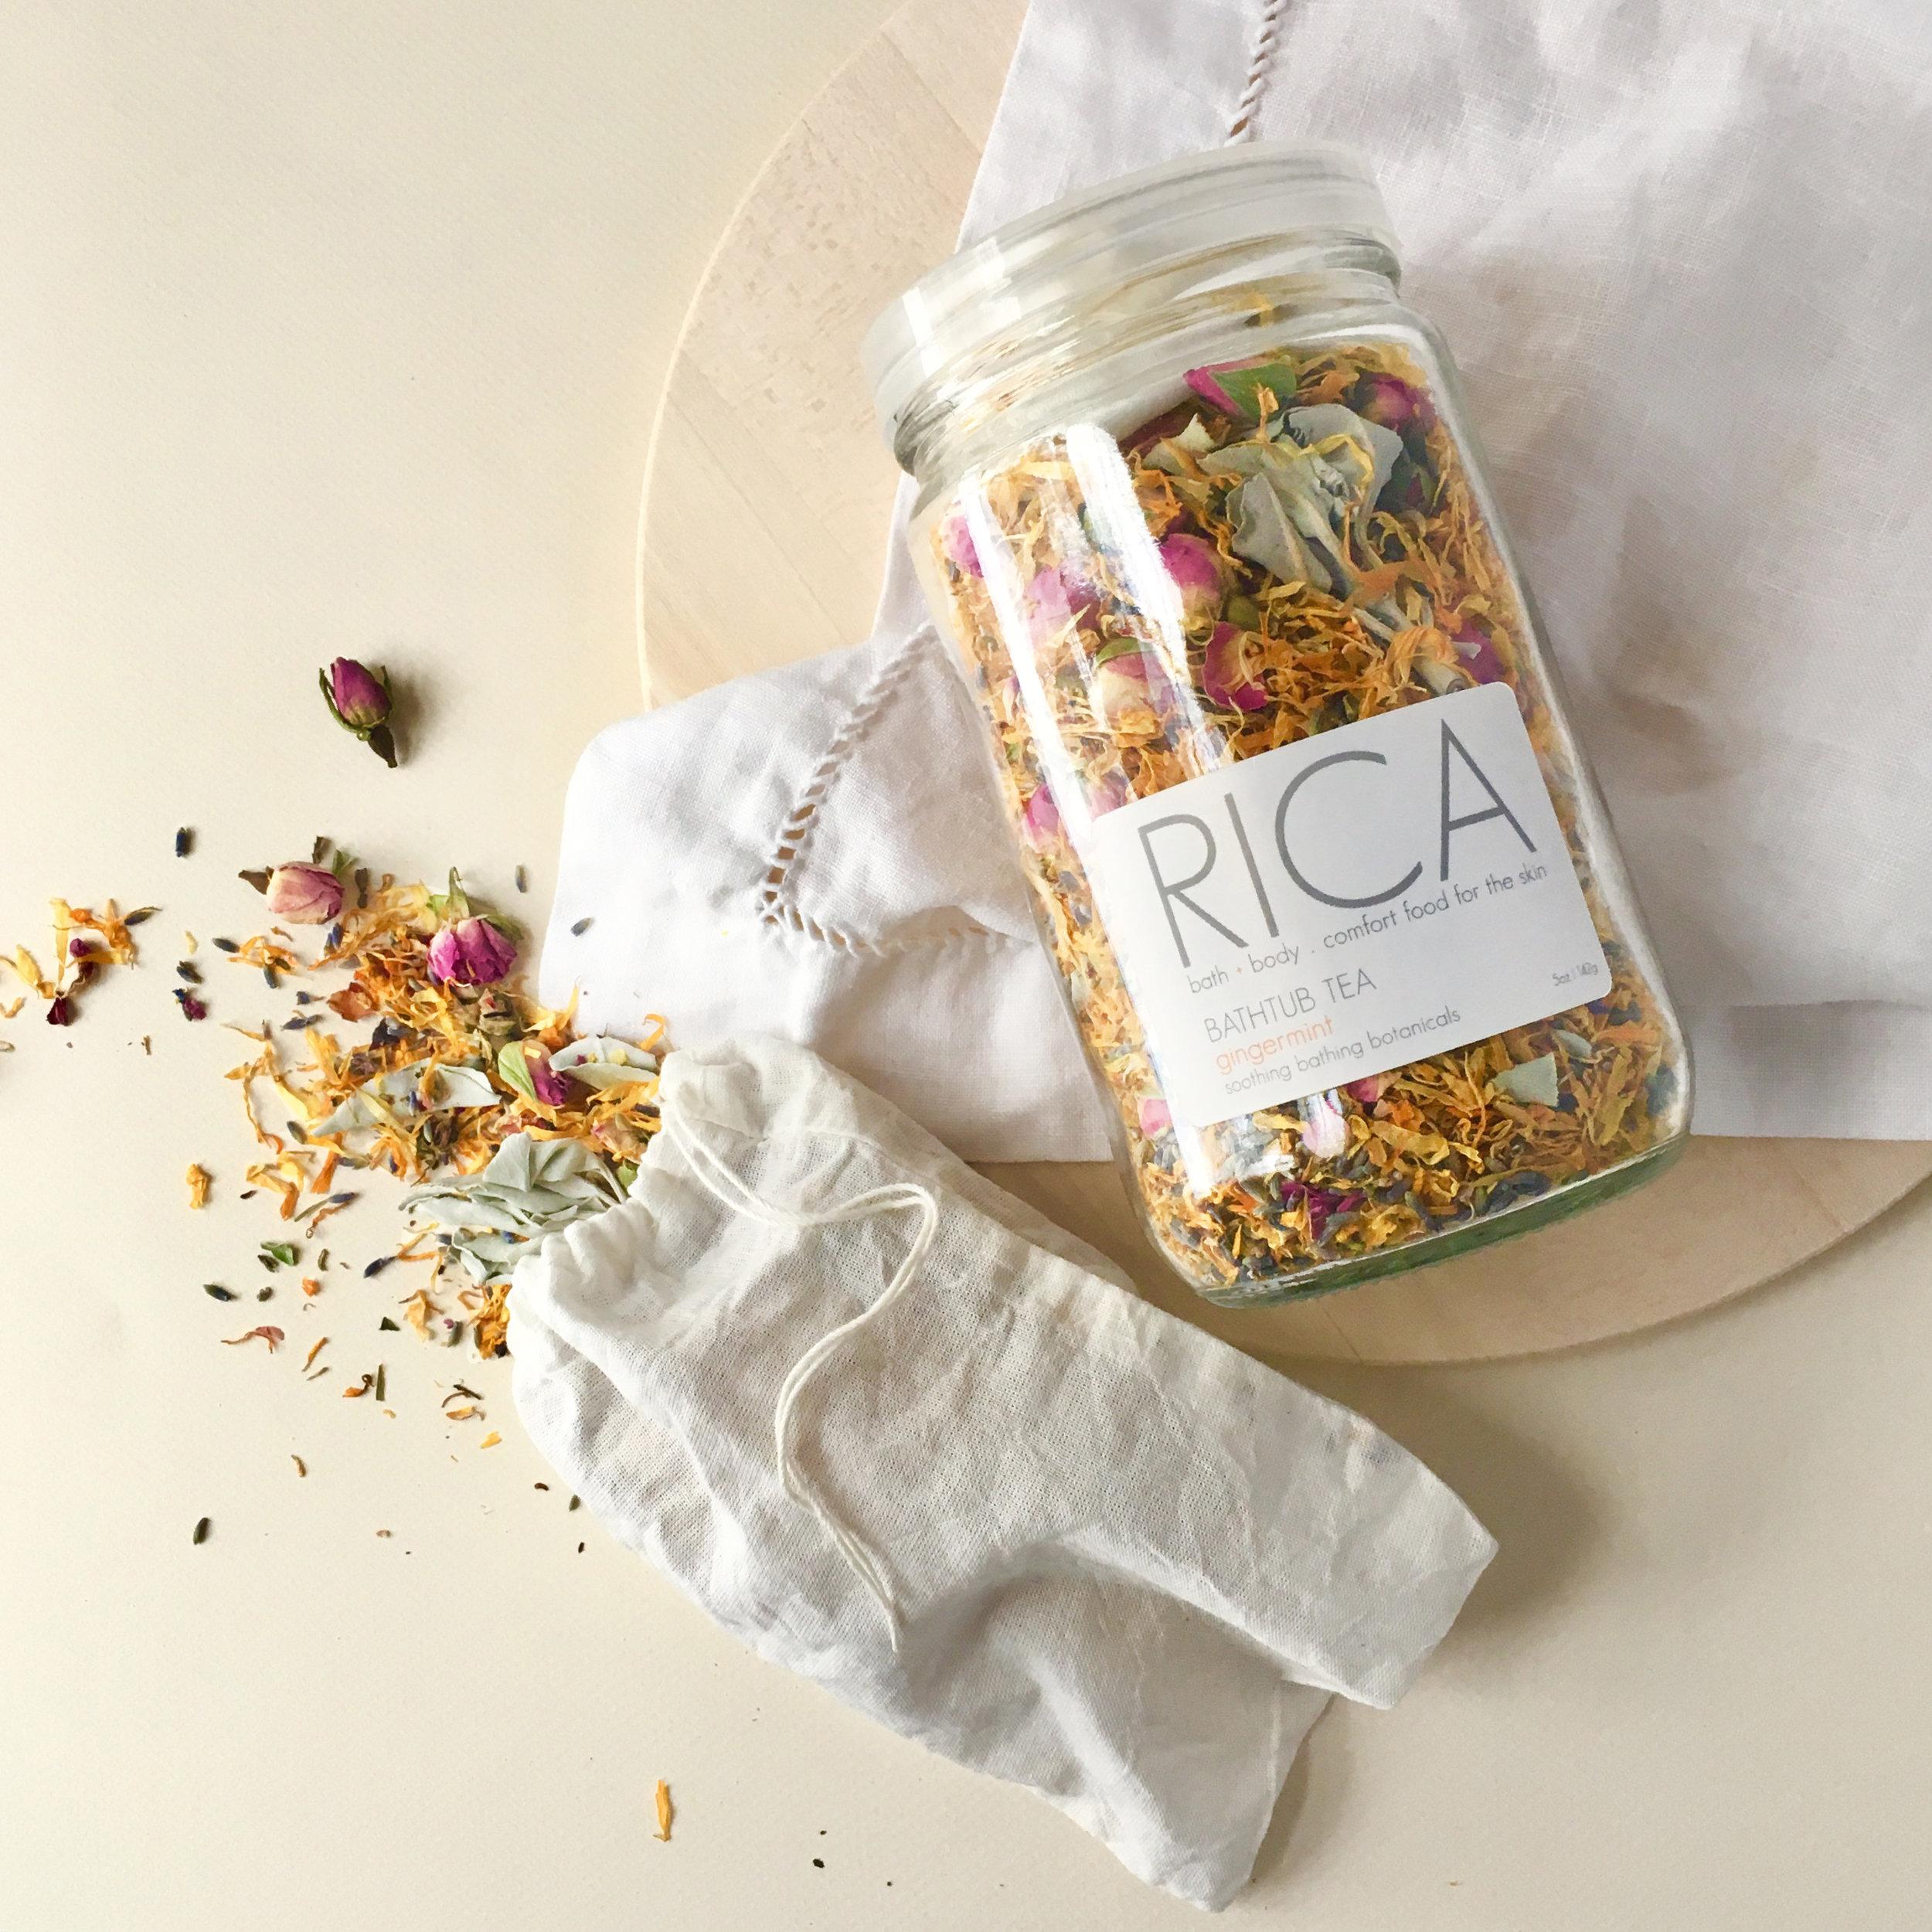 RICA bath + body Bathtub Tea Gingermint Bird's Square Lighter.jpg